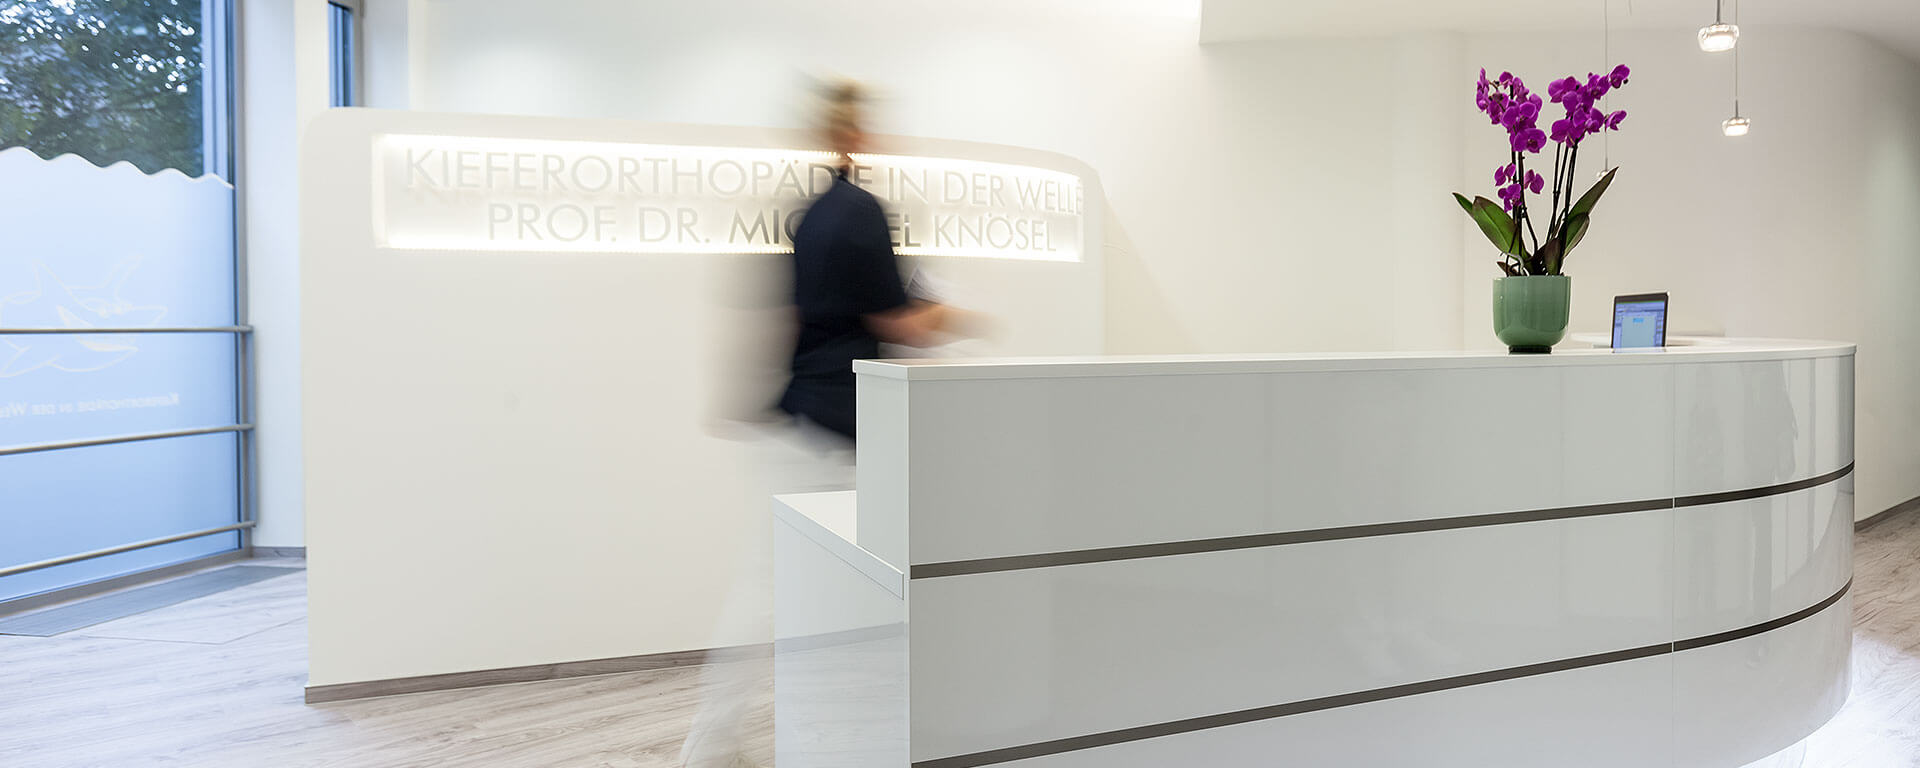 Kieferorthopäde Hamburg - Erstellung Planunterlagen